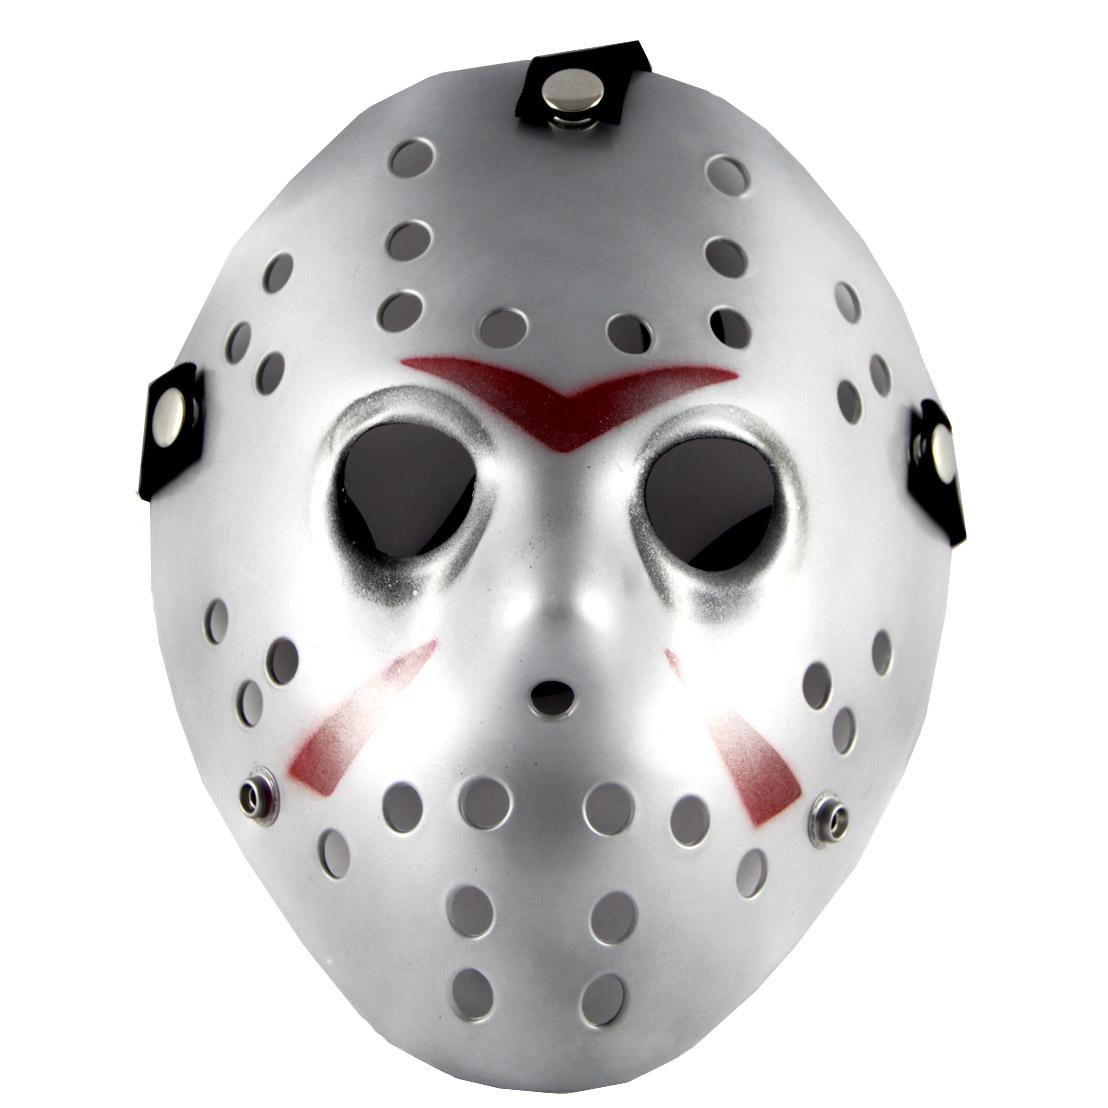 The Killer Clown Craze Print Paper Masks